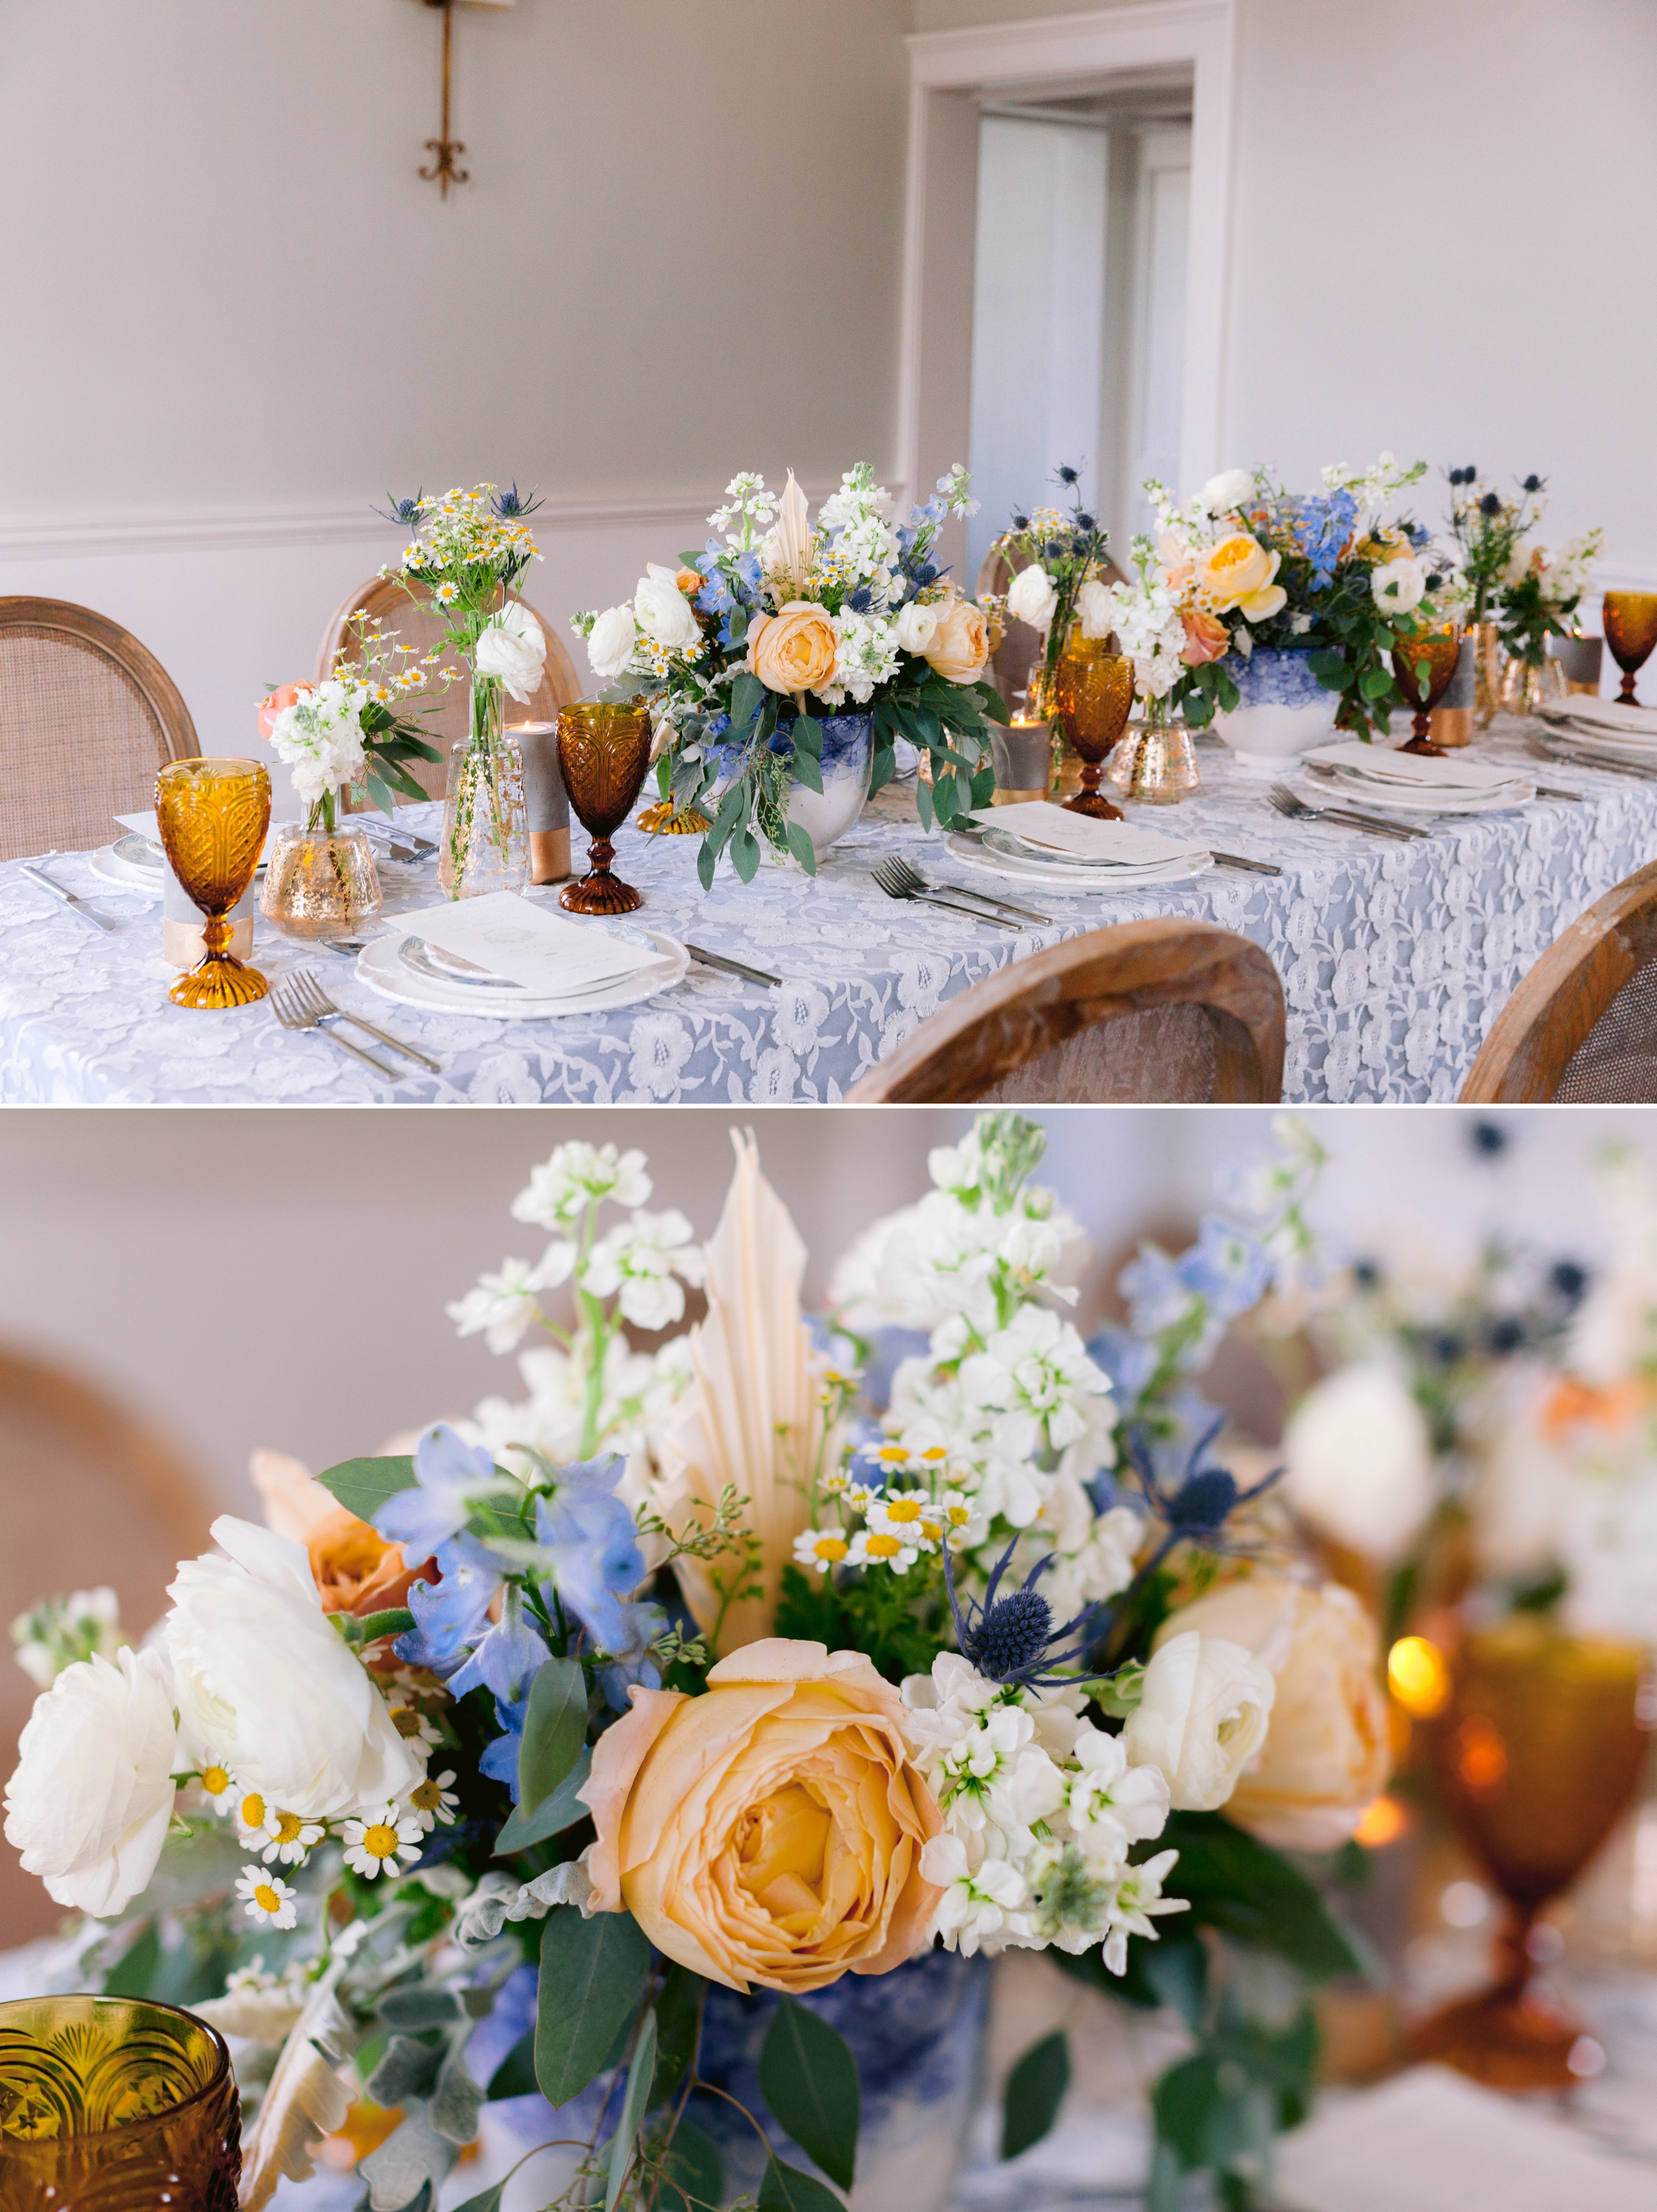 Table Set up with white and blue tablecloth, white and pastel china and pastel flowers - martha stewart weddings - style me pretty - Dusty Blue Wedding Inspiration - fine art photography - Honolulu, Oahu, Hawaii Wedding Photographer - johanna dye